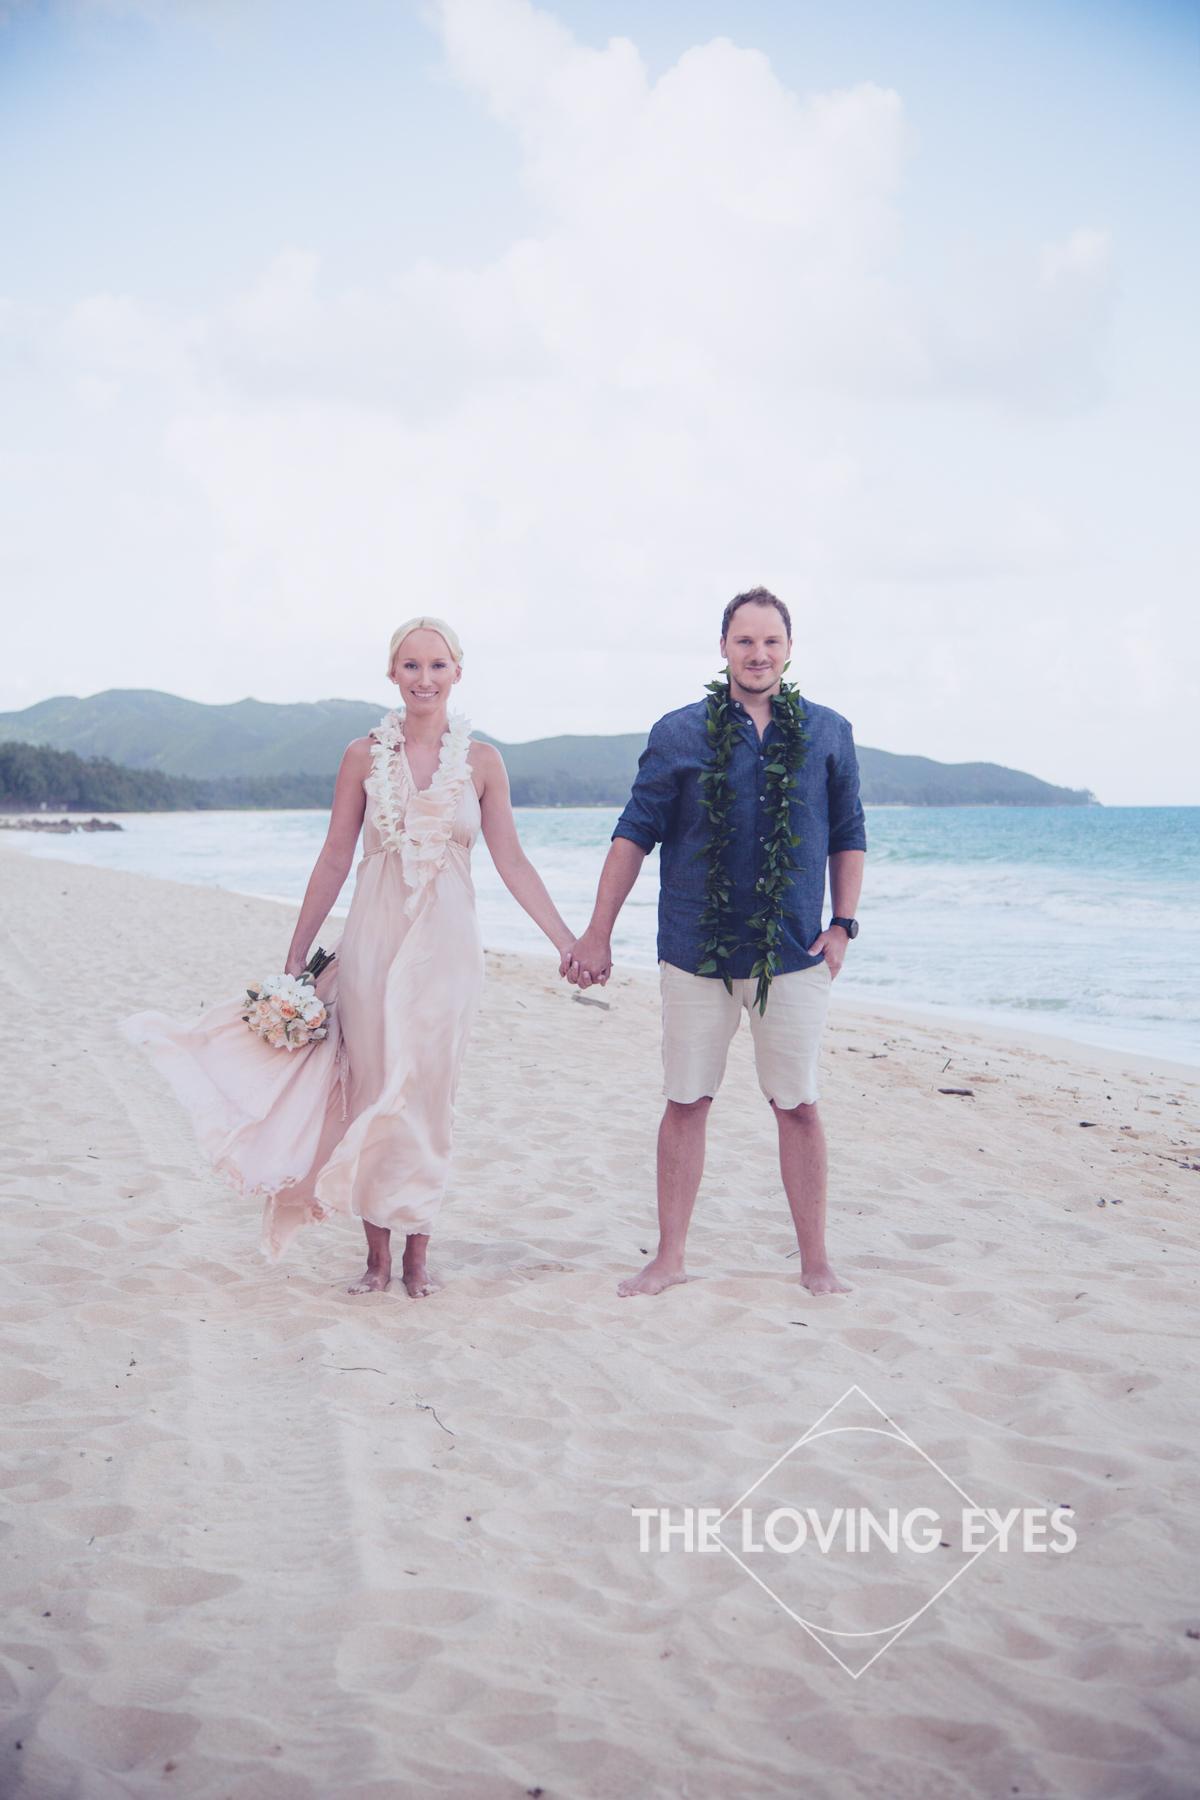 Bride and groom on white sandy beach during Hawaiian beach elopement